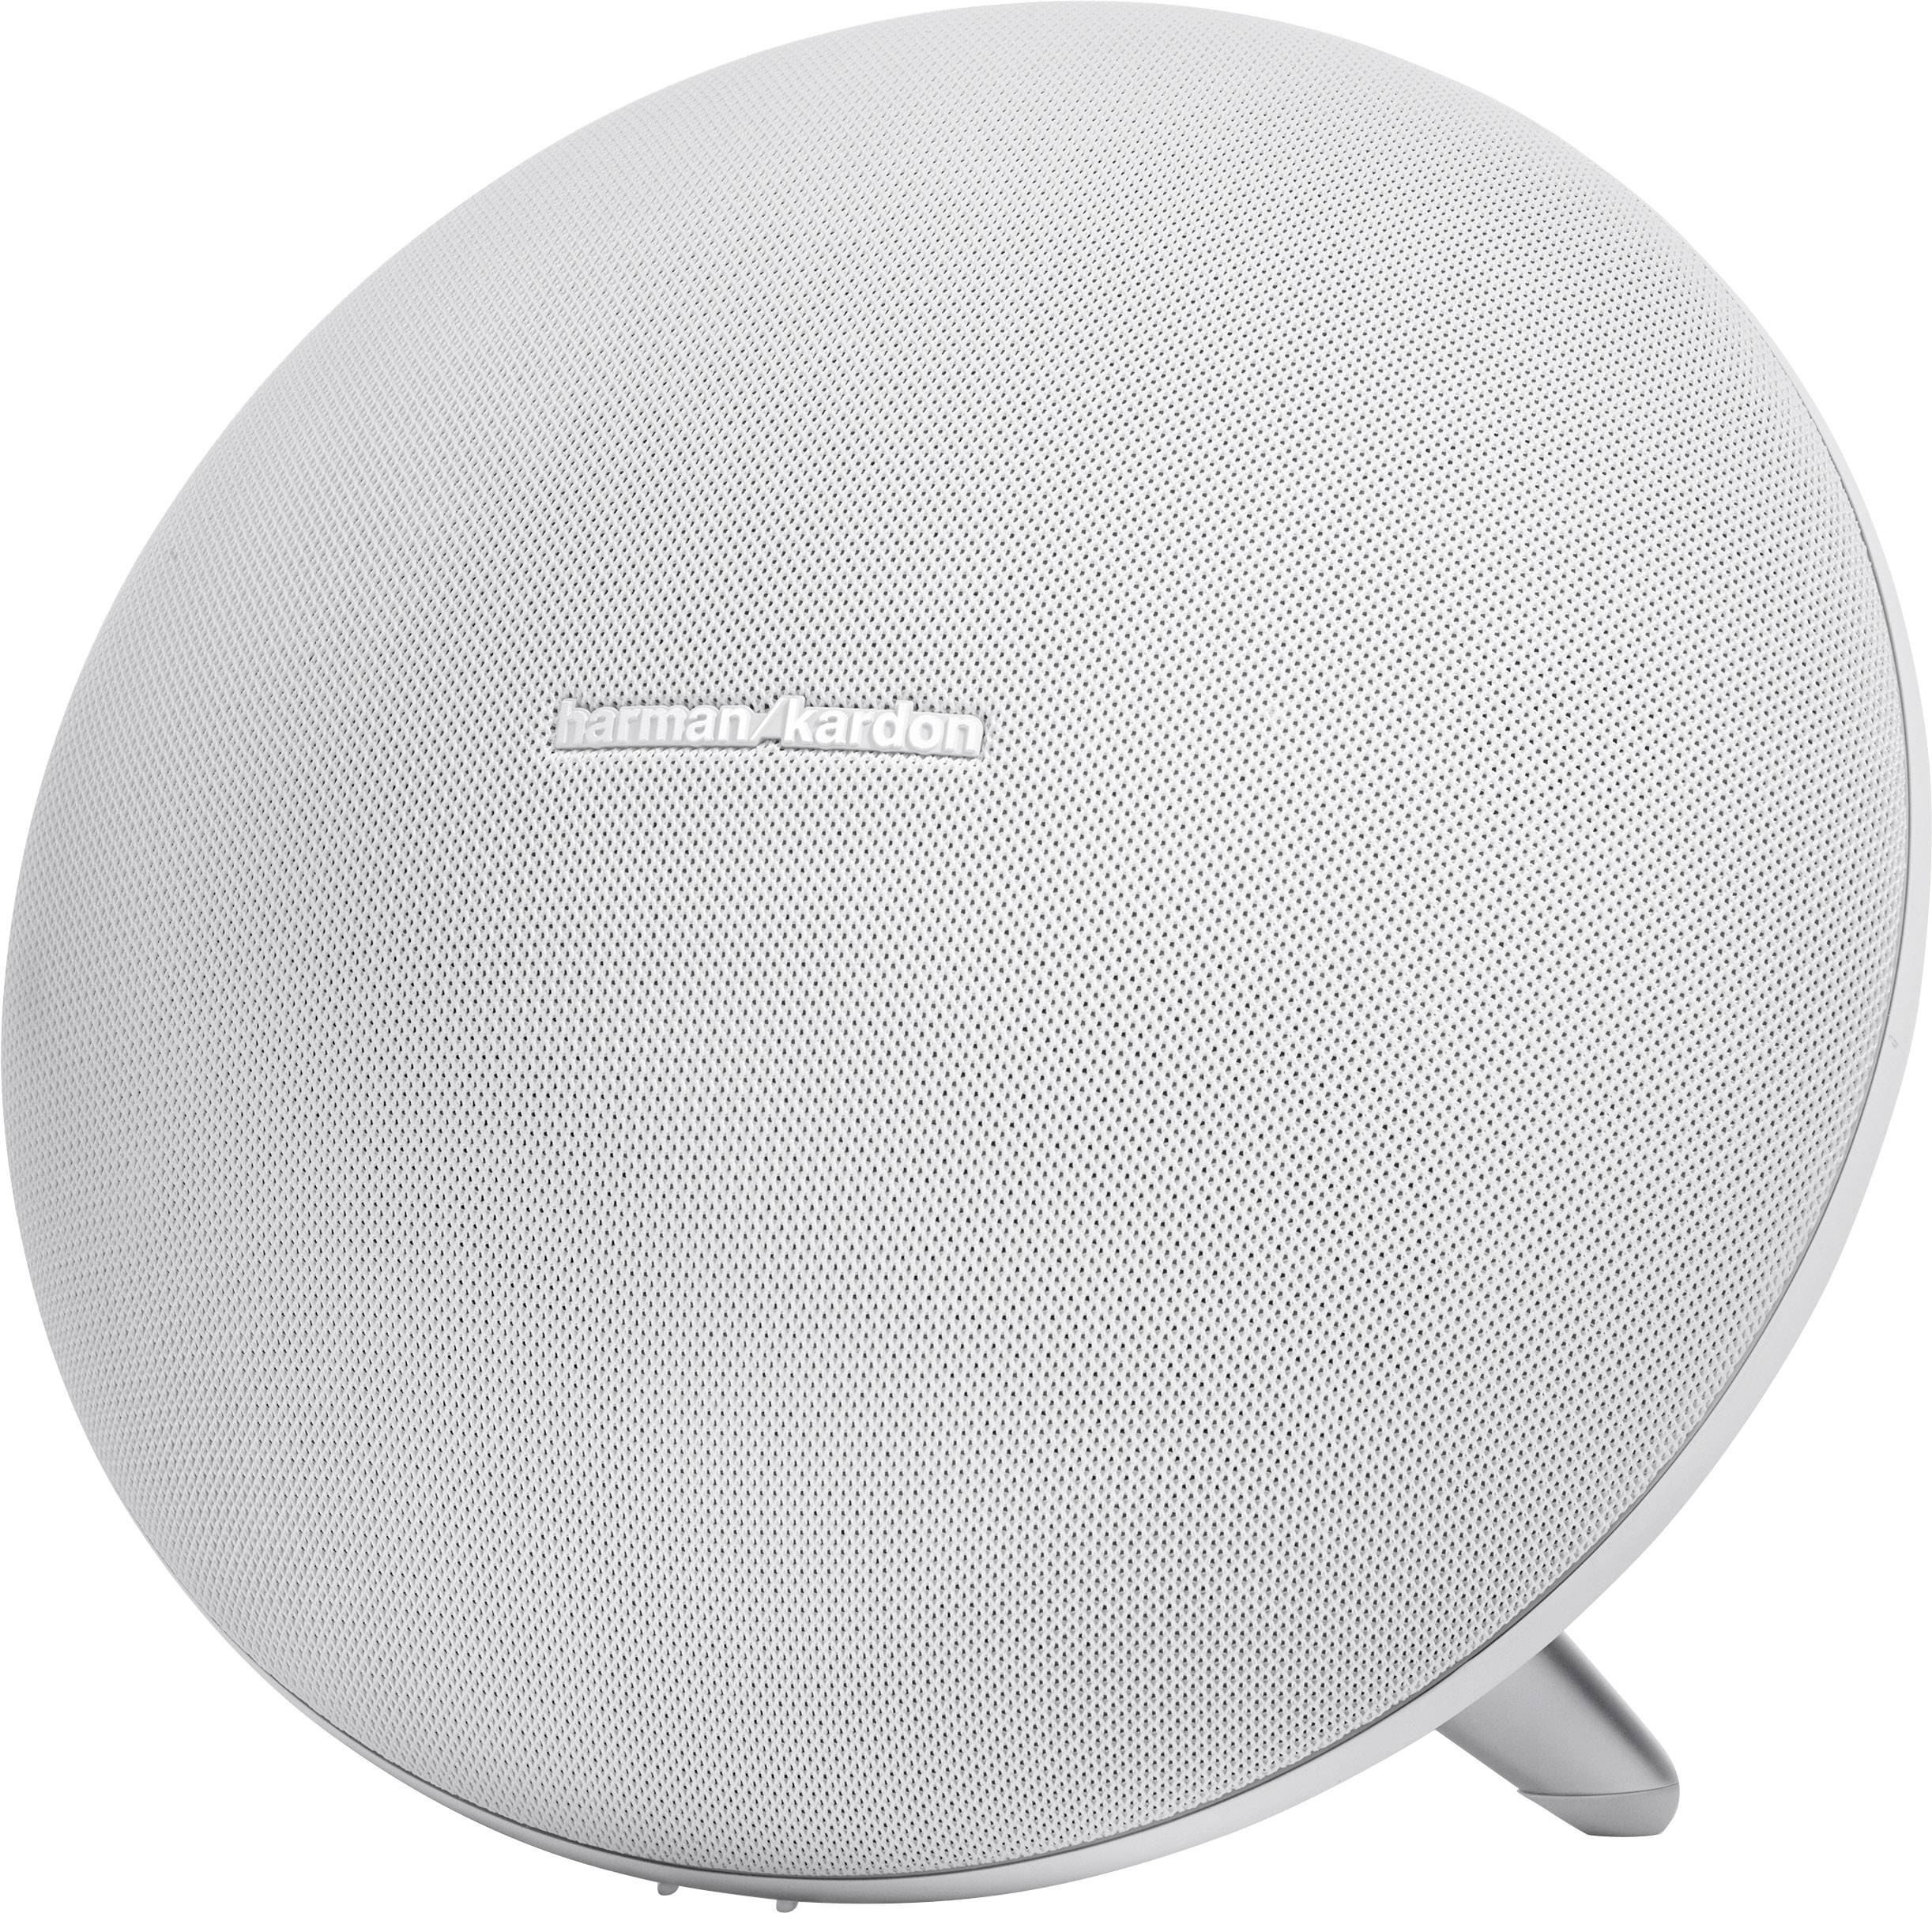 Bluetooth speaker Harman Kardon Onyx Studio 3 Handsfree